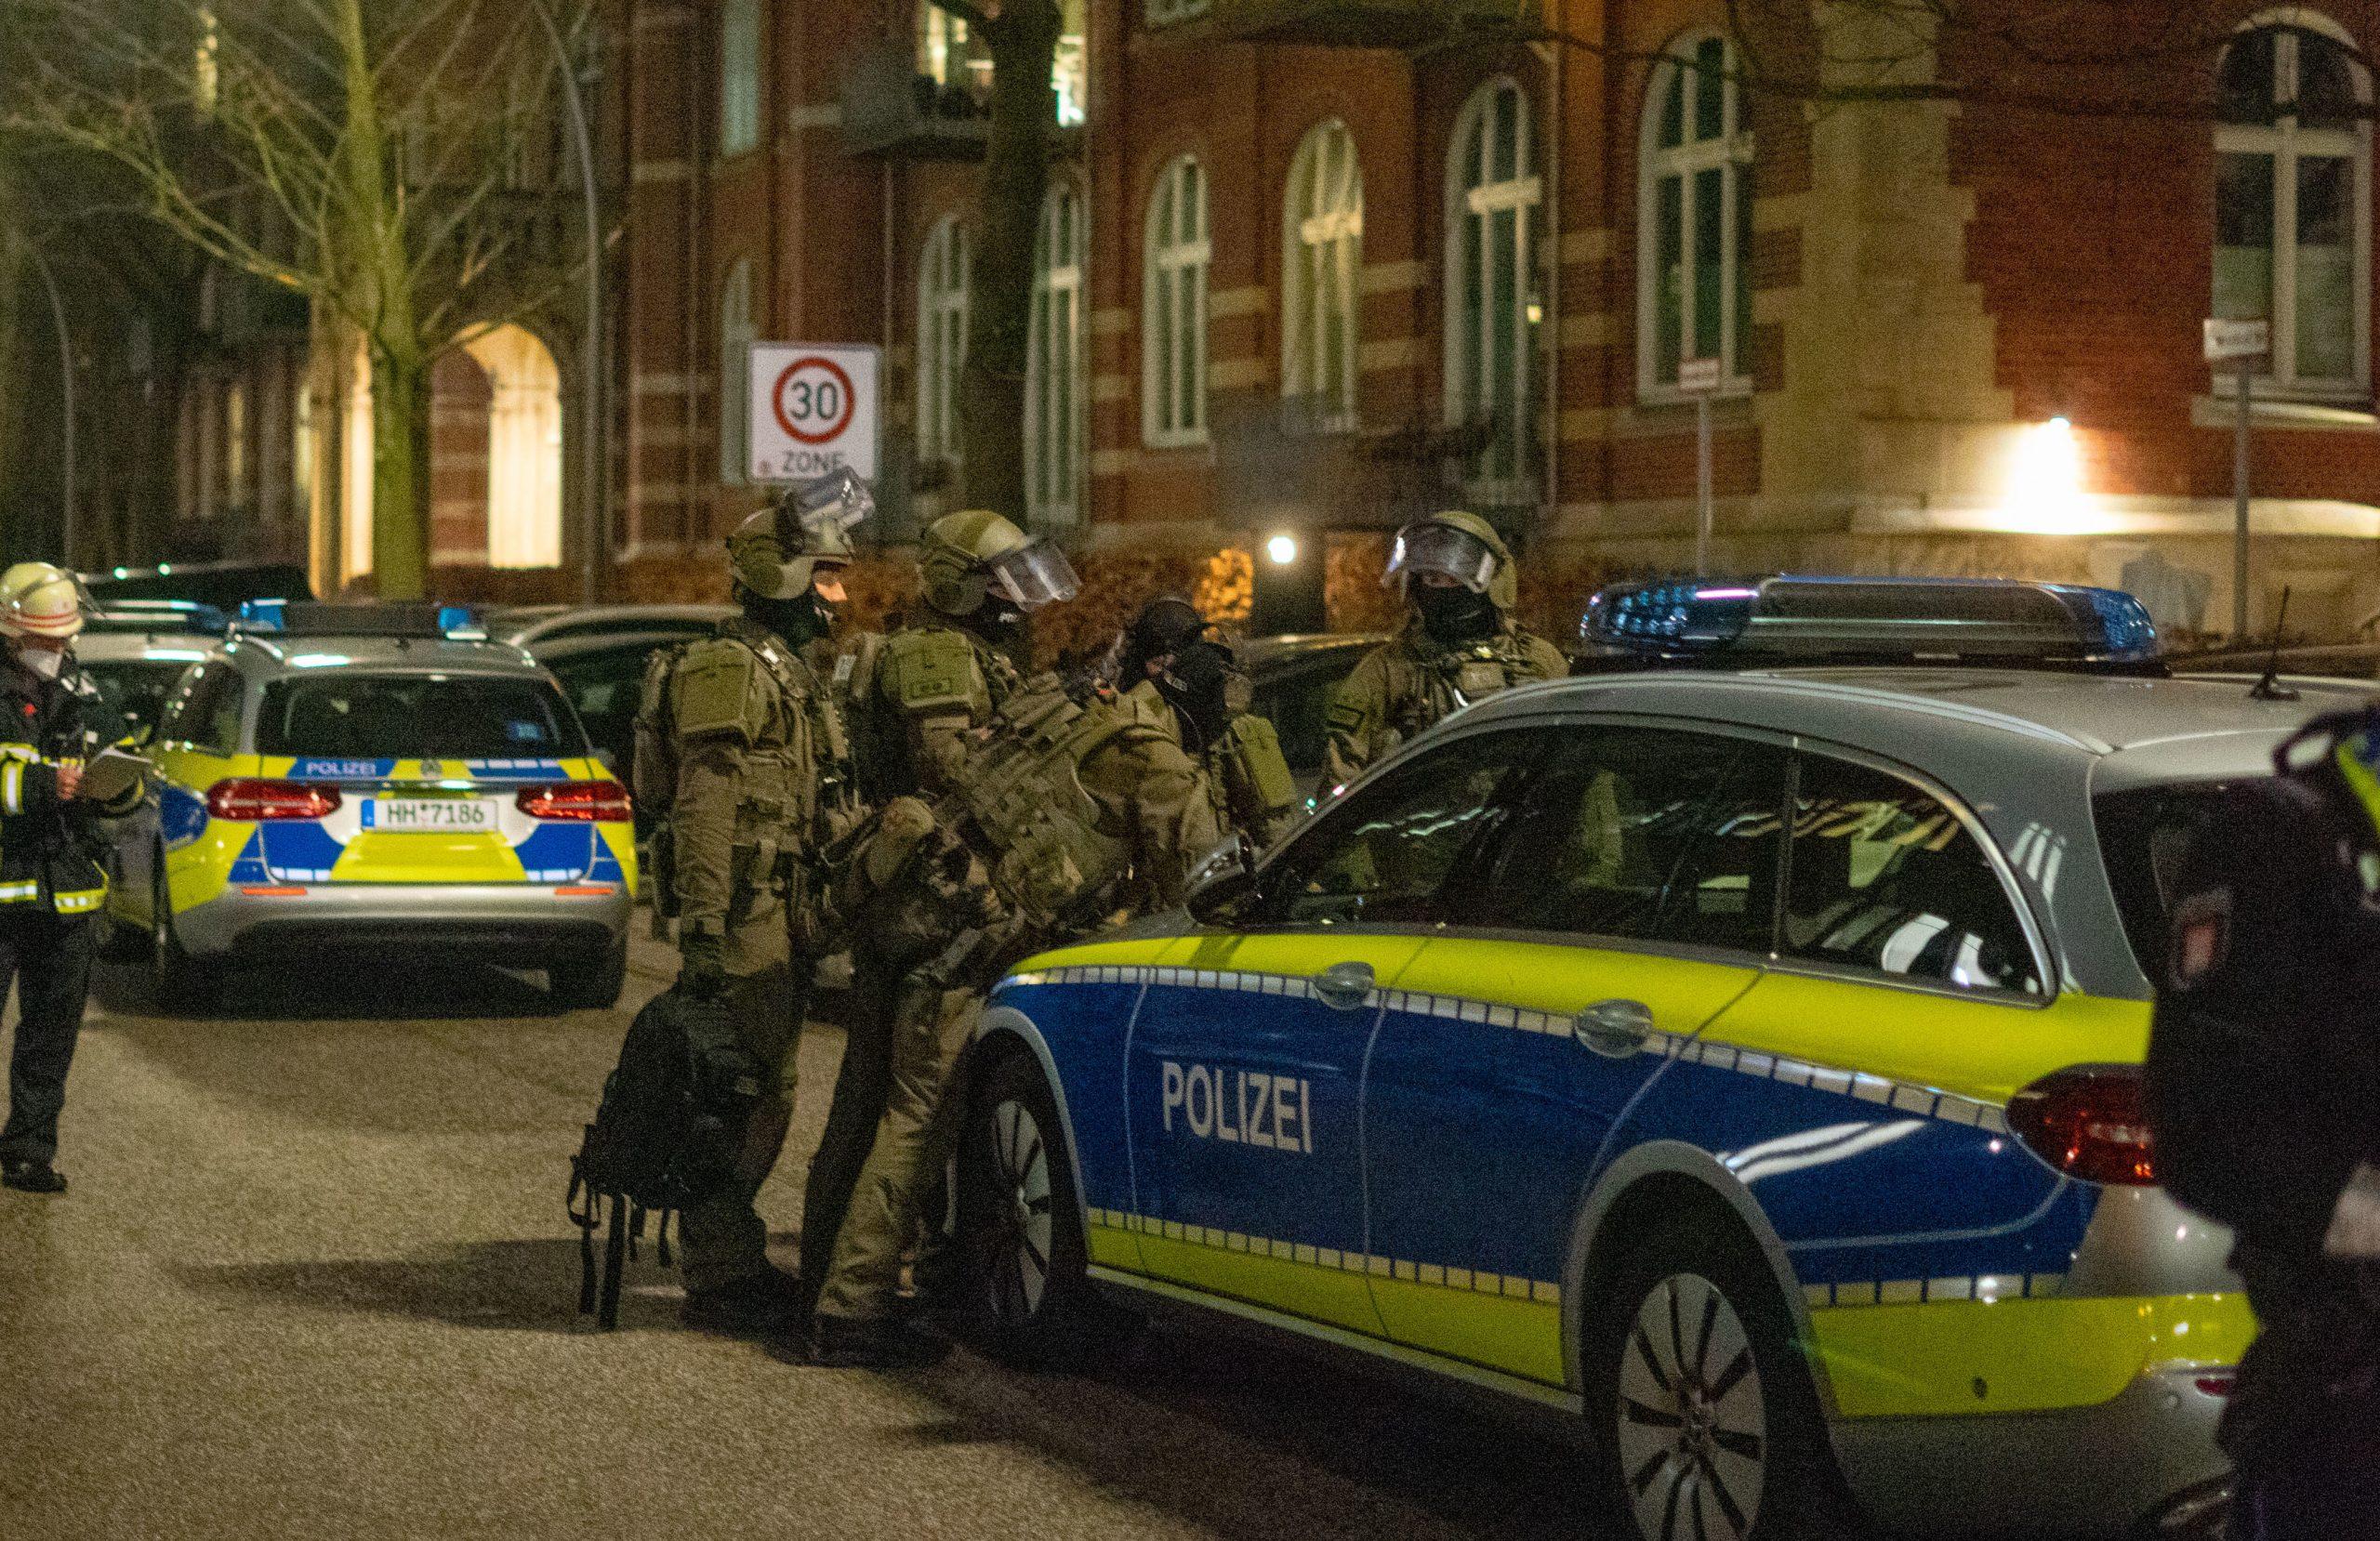 Familienstreit-eskaliert-SEK-nimmt-bewaffneten-Mann-fest